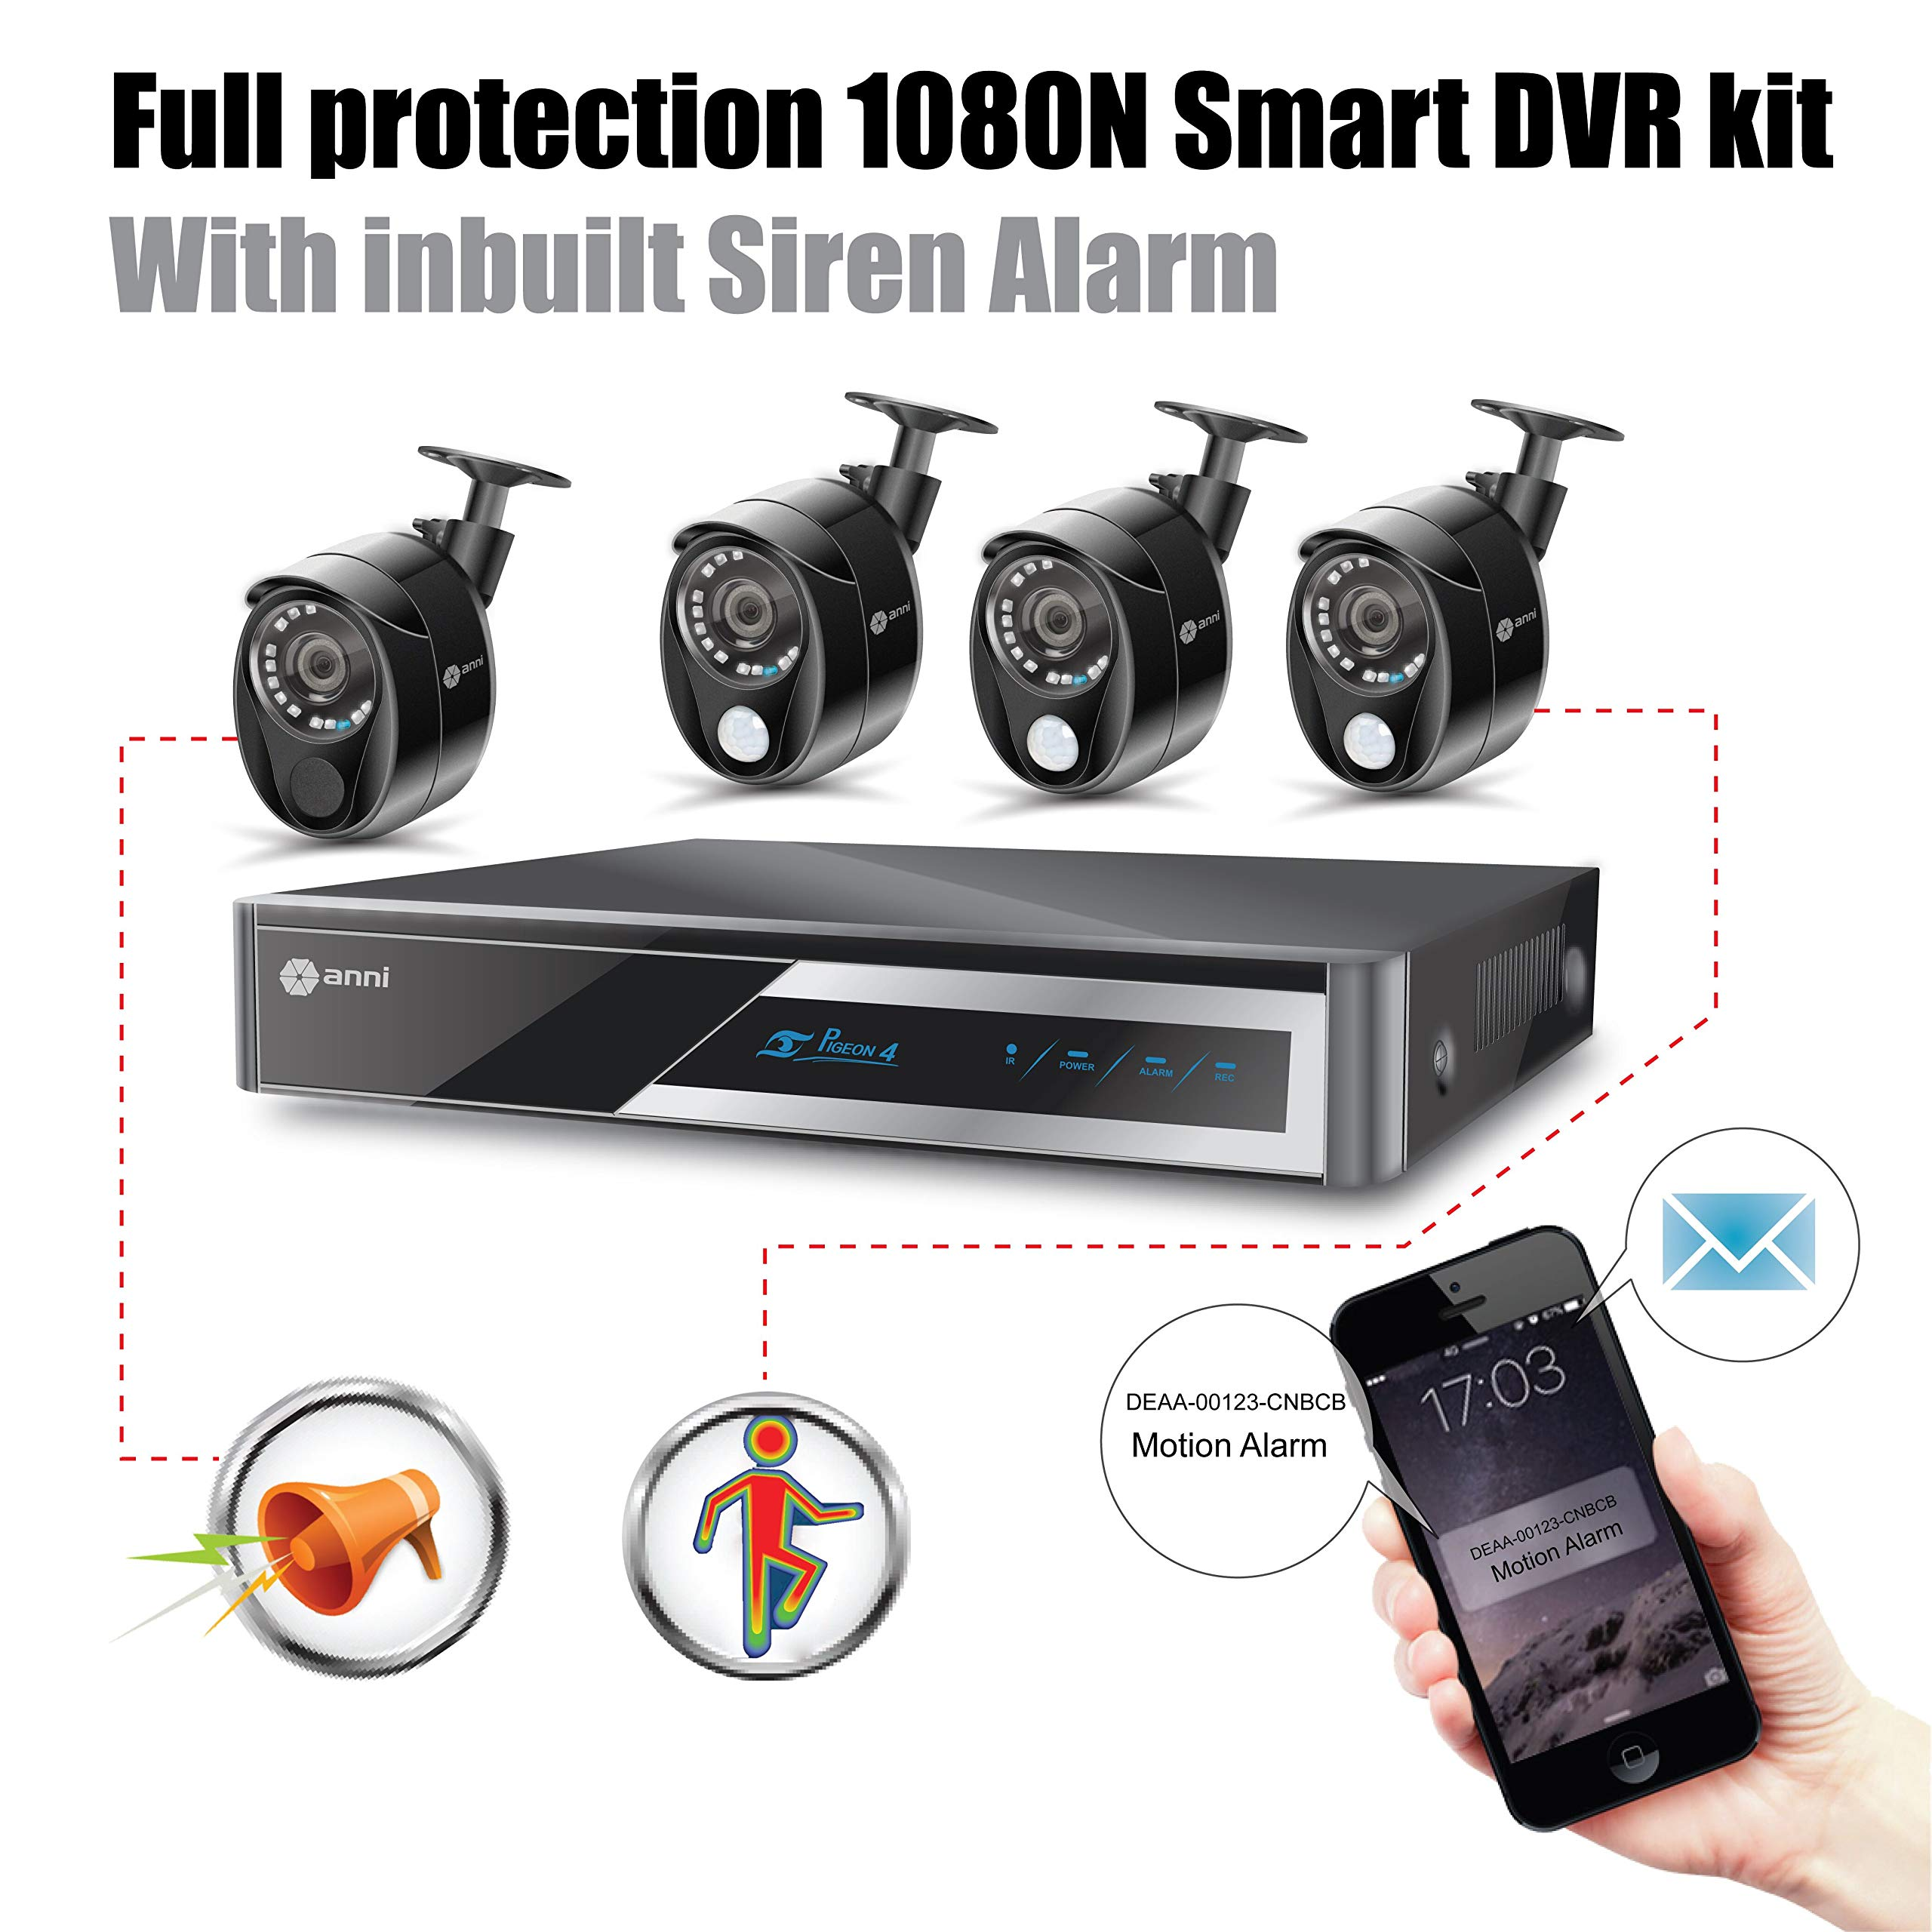 Anni 1080N HD Home Security Camera System CCTV Wired Surveillance DVR Kit, 4-Channel 1080N Digital Video Recorder, 4 x 1080p Cameras: 3 x PIR Sensor Camera, 1 x Siren Alarm Camera by anni